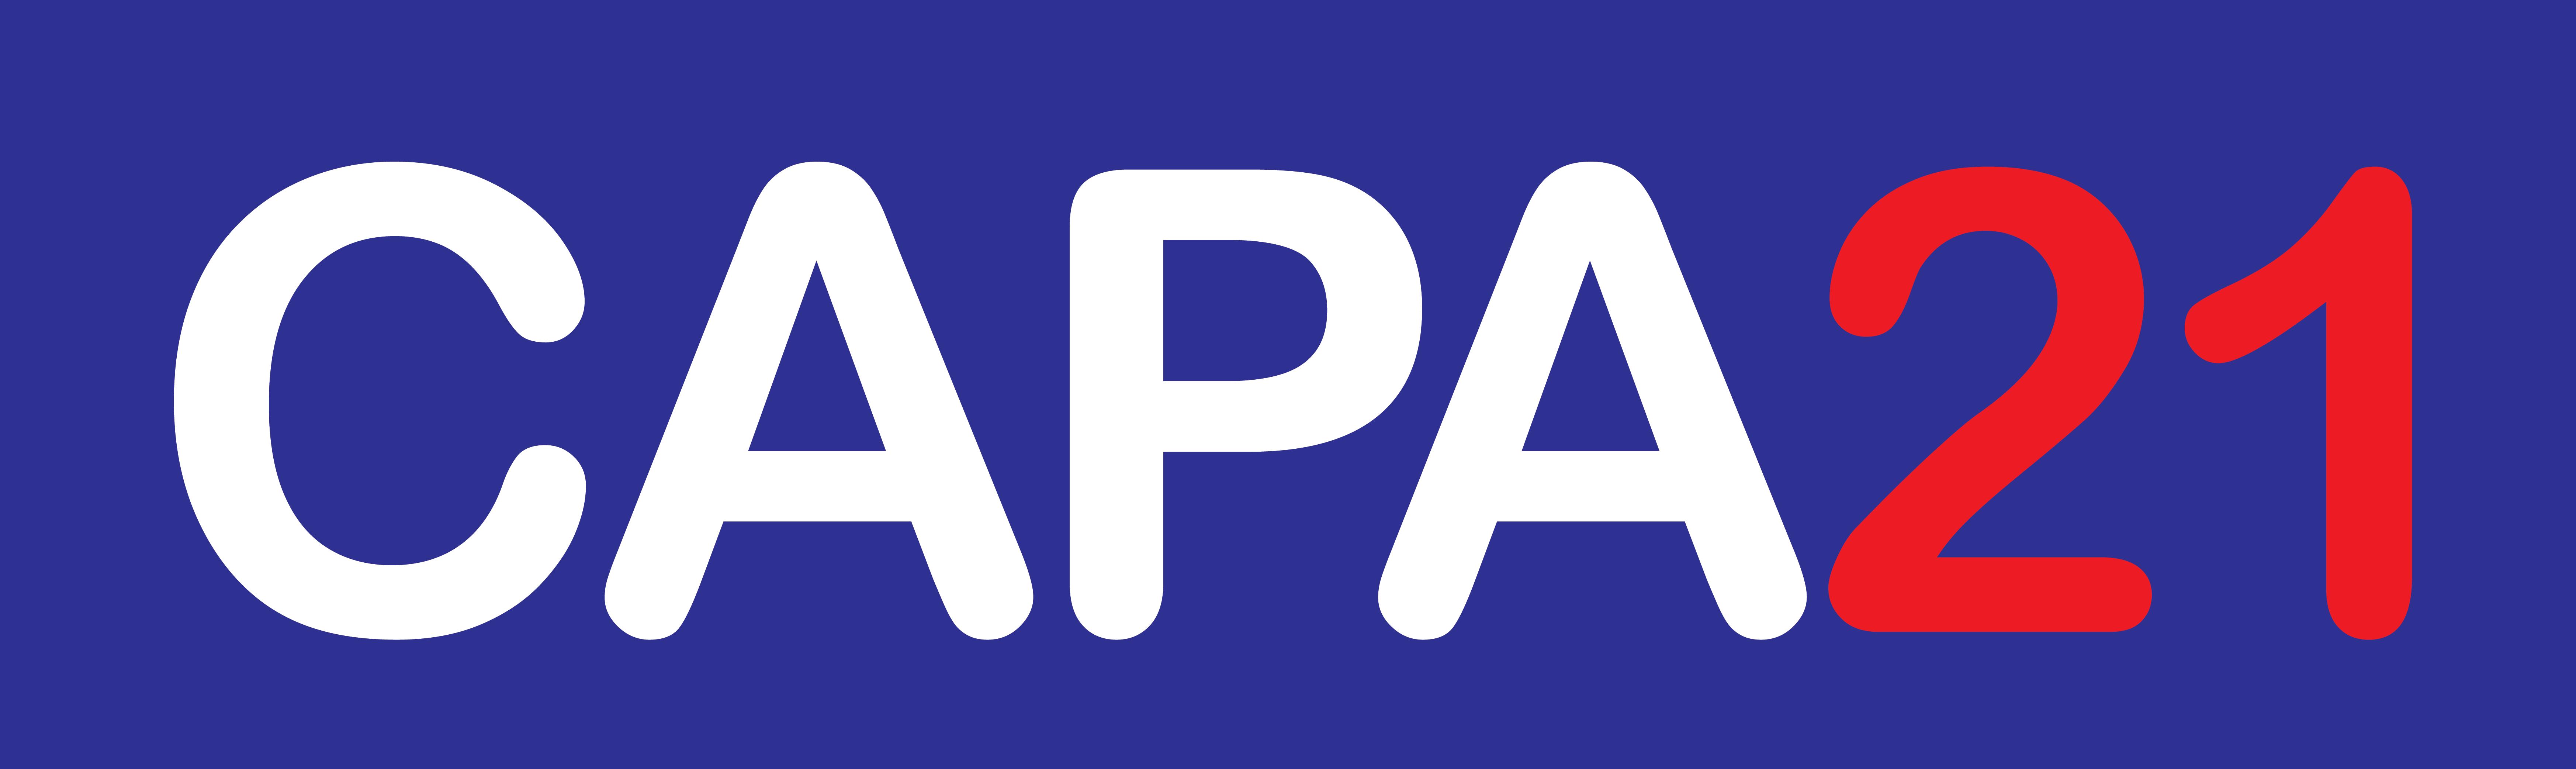 CAPA21 PAC